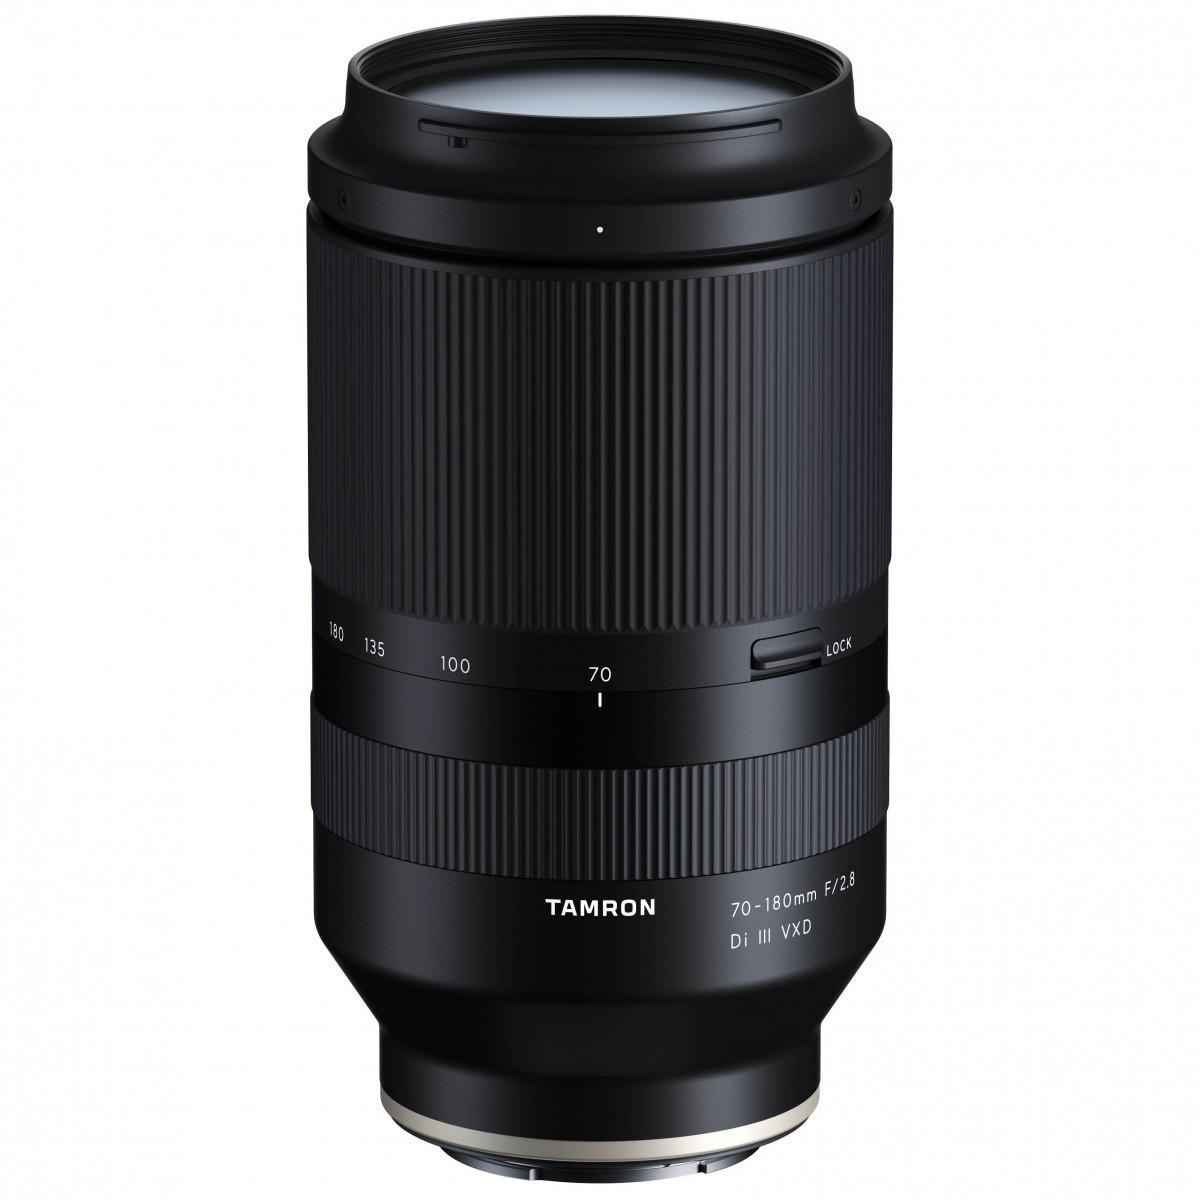 Tamron 70-180mm F2.8 Di III VXD Objektiv für Sony E-Mount